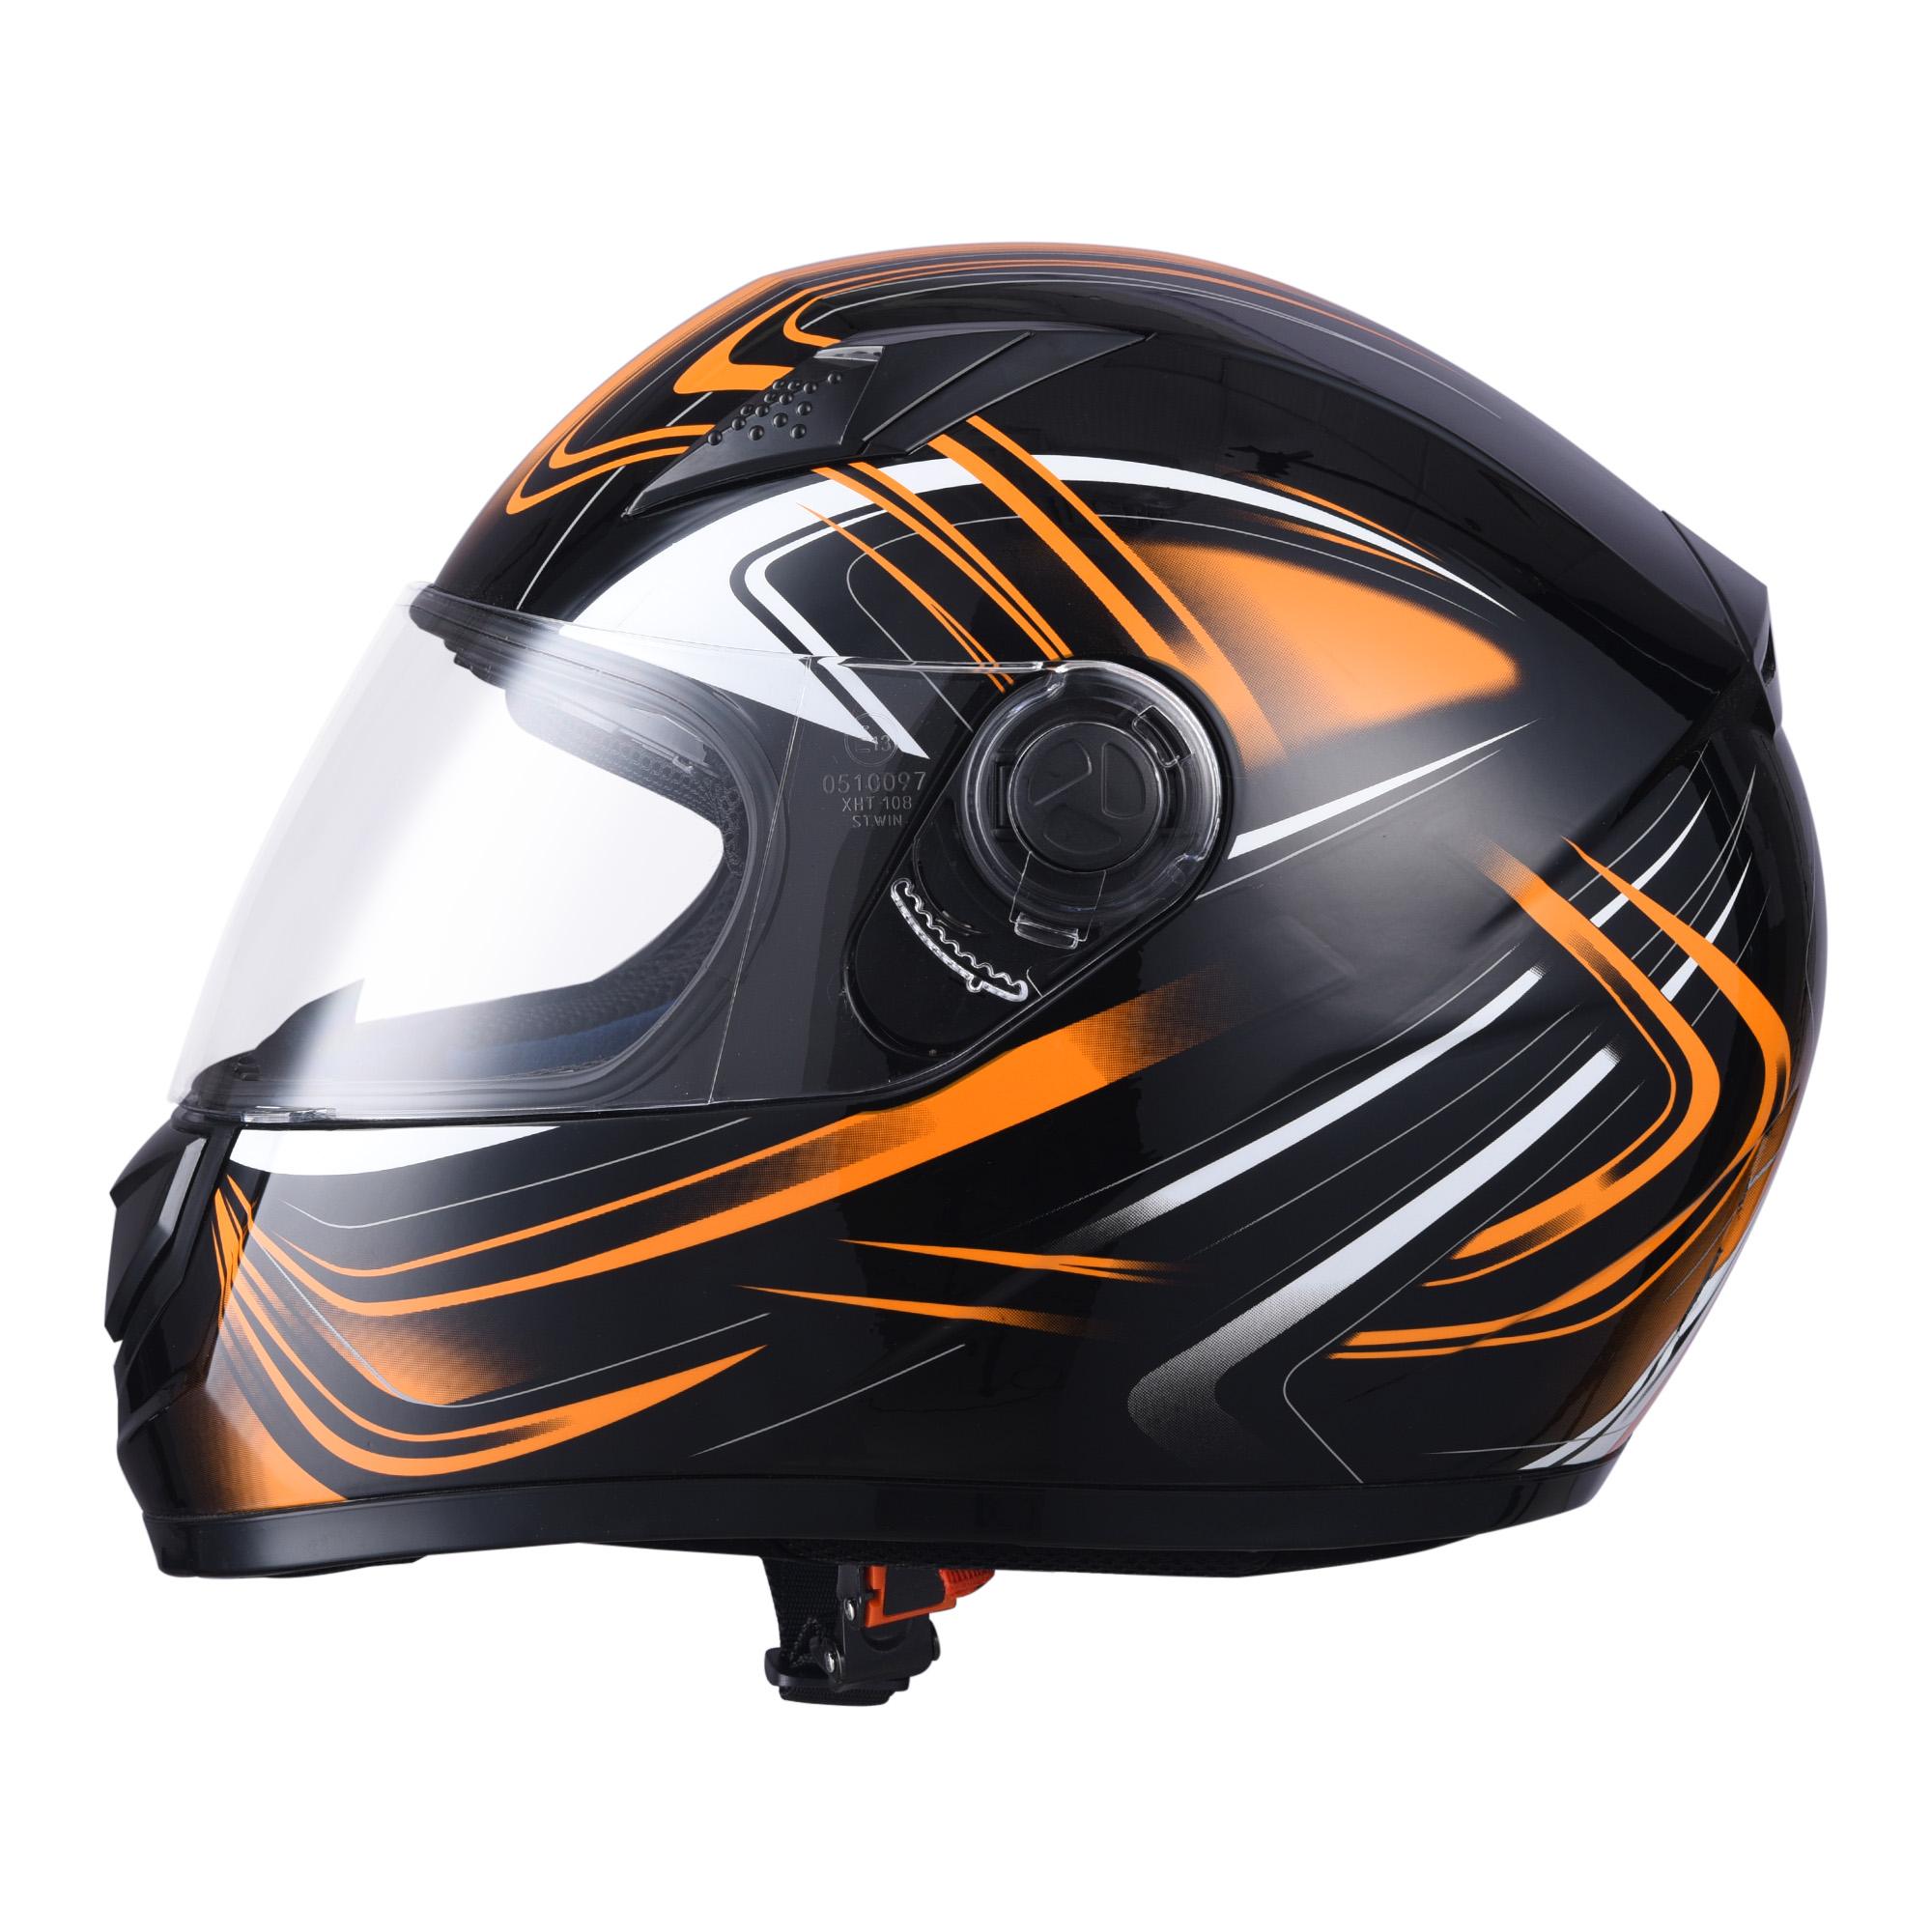 miniature 146 - AHR K12 Full Face Motorcycle Helmet DOT Air Vents Clear Visor Racing S M L XL